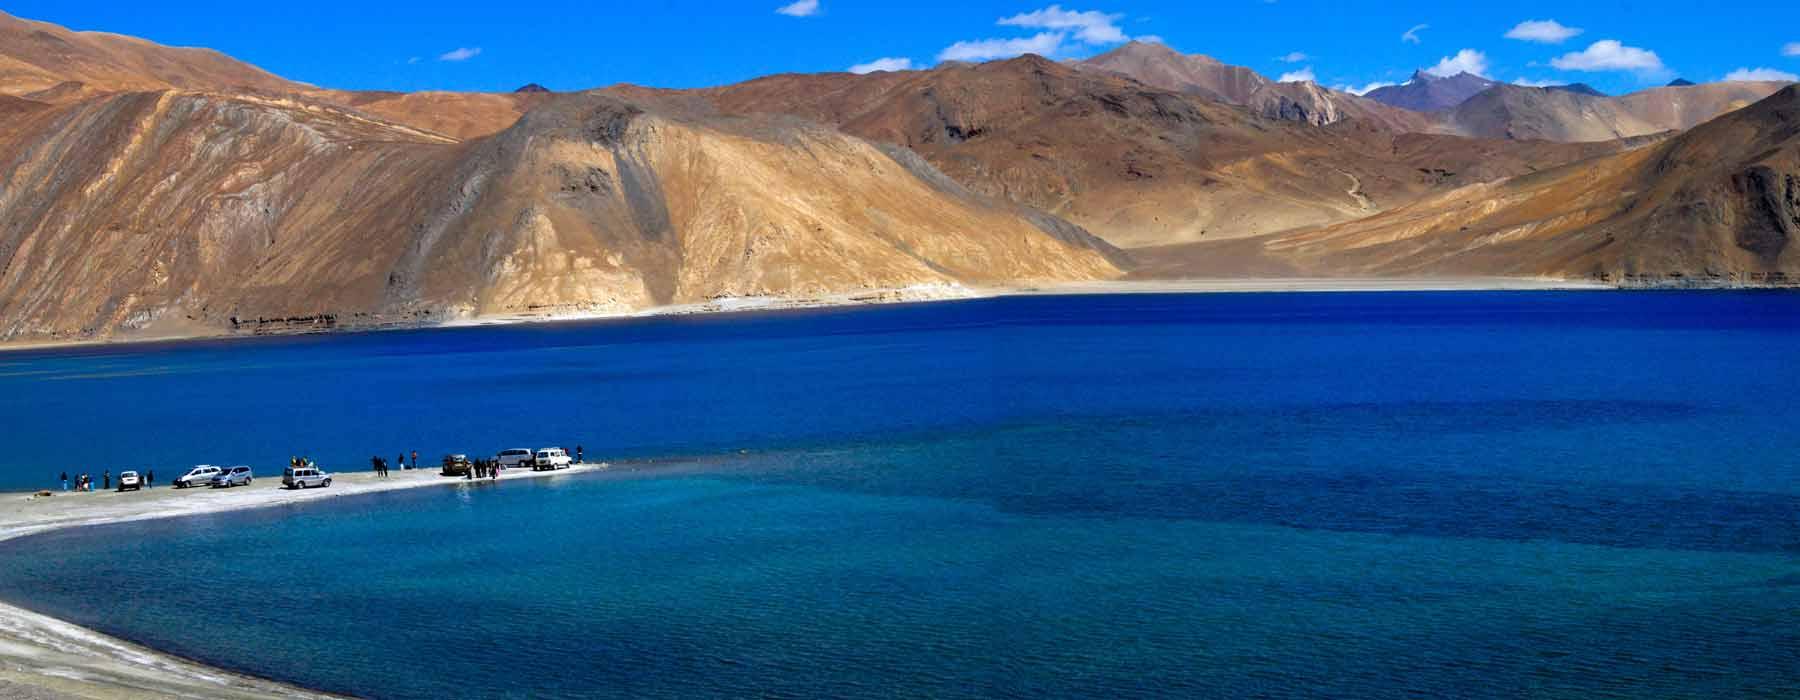 1486130113-leh-ladakh-pangong-lake-tour.jpg